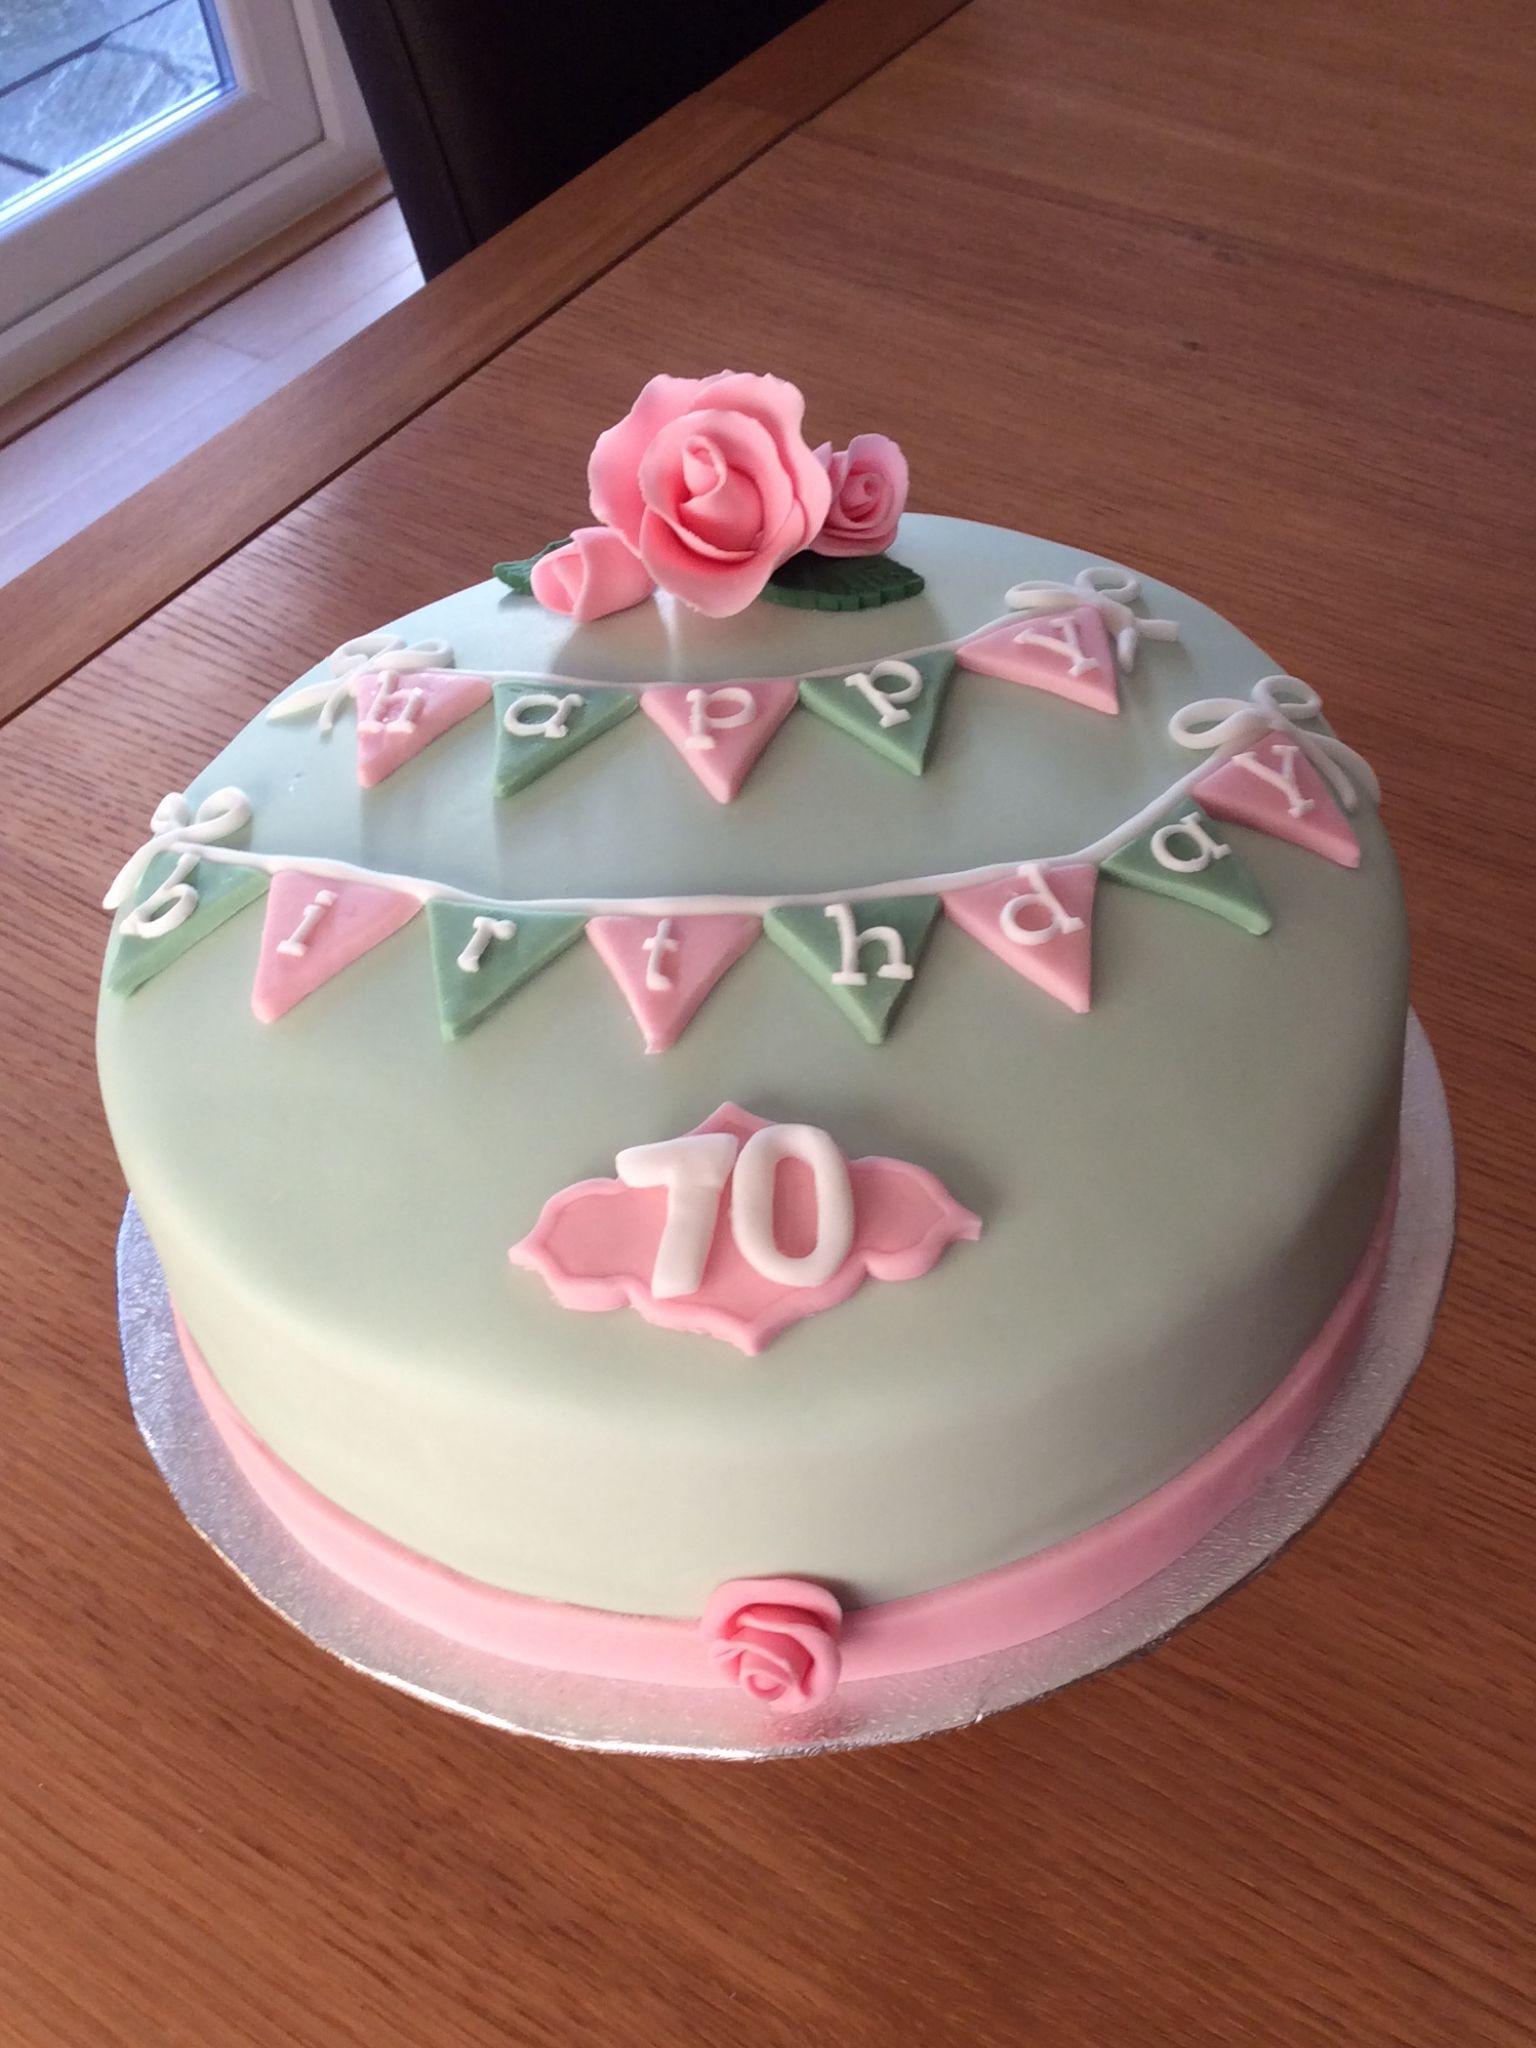 70th Birthday Cake Pinteres